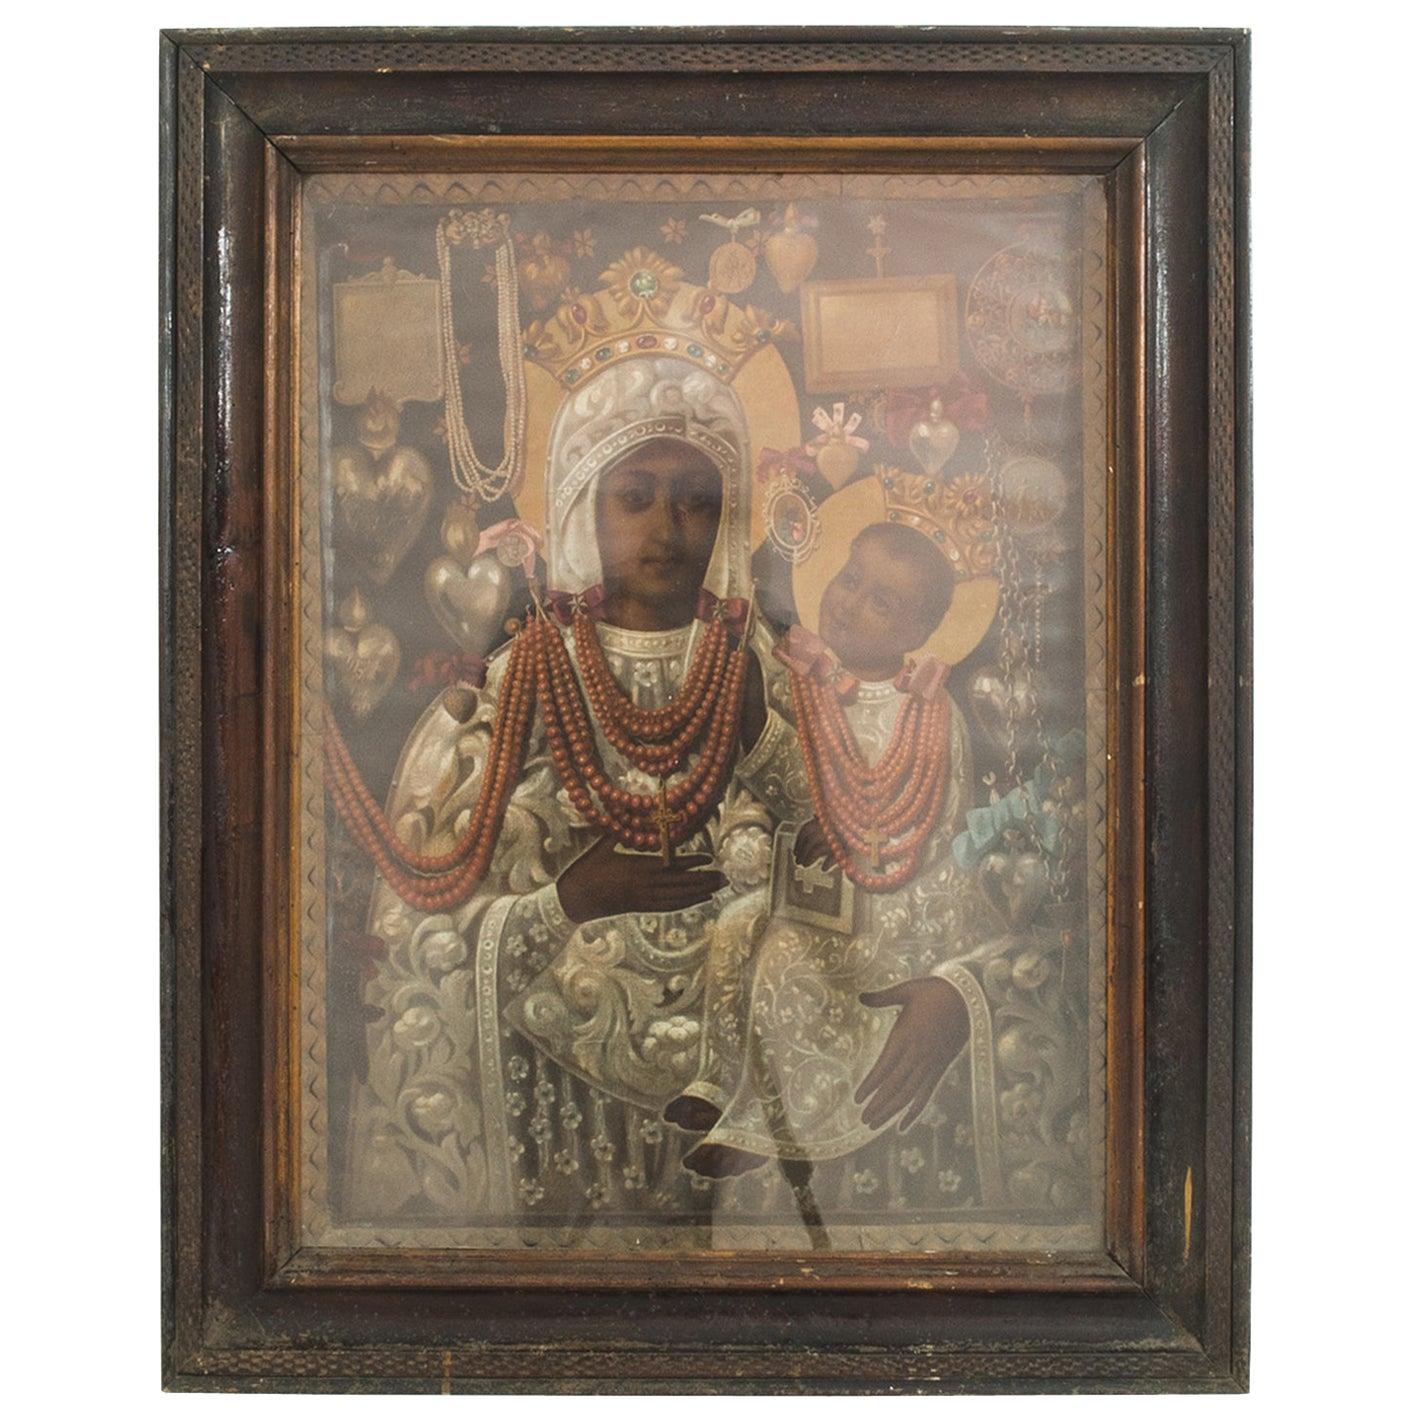 Vintage Central European Madonna with Wooden Frame